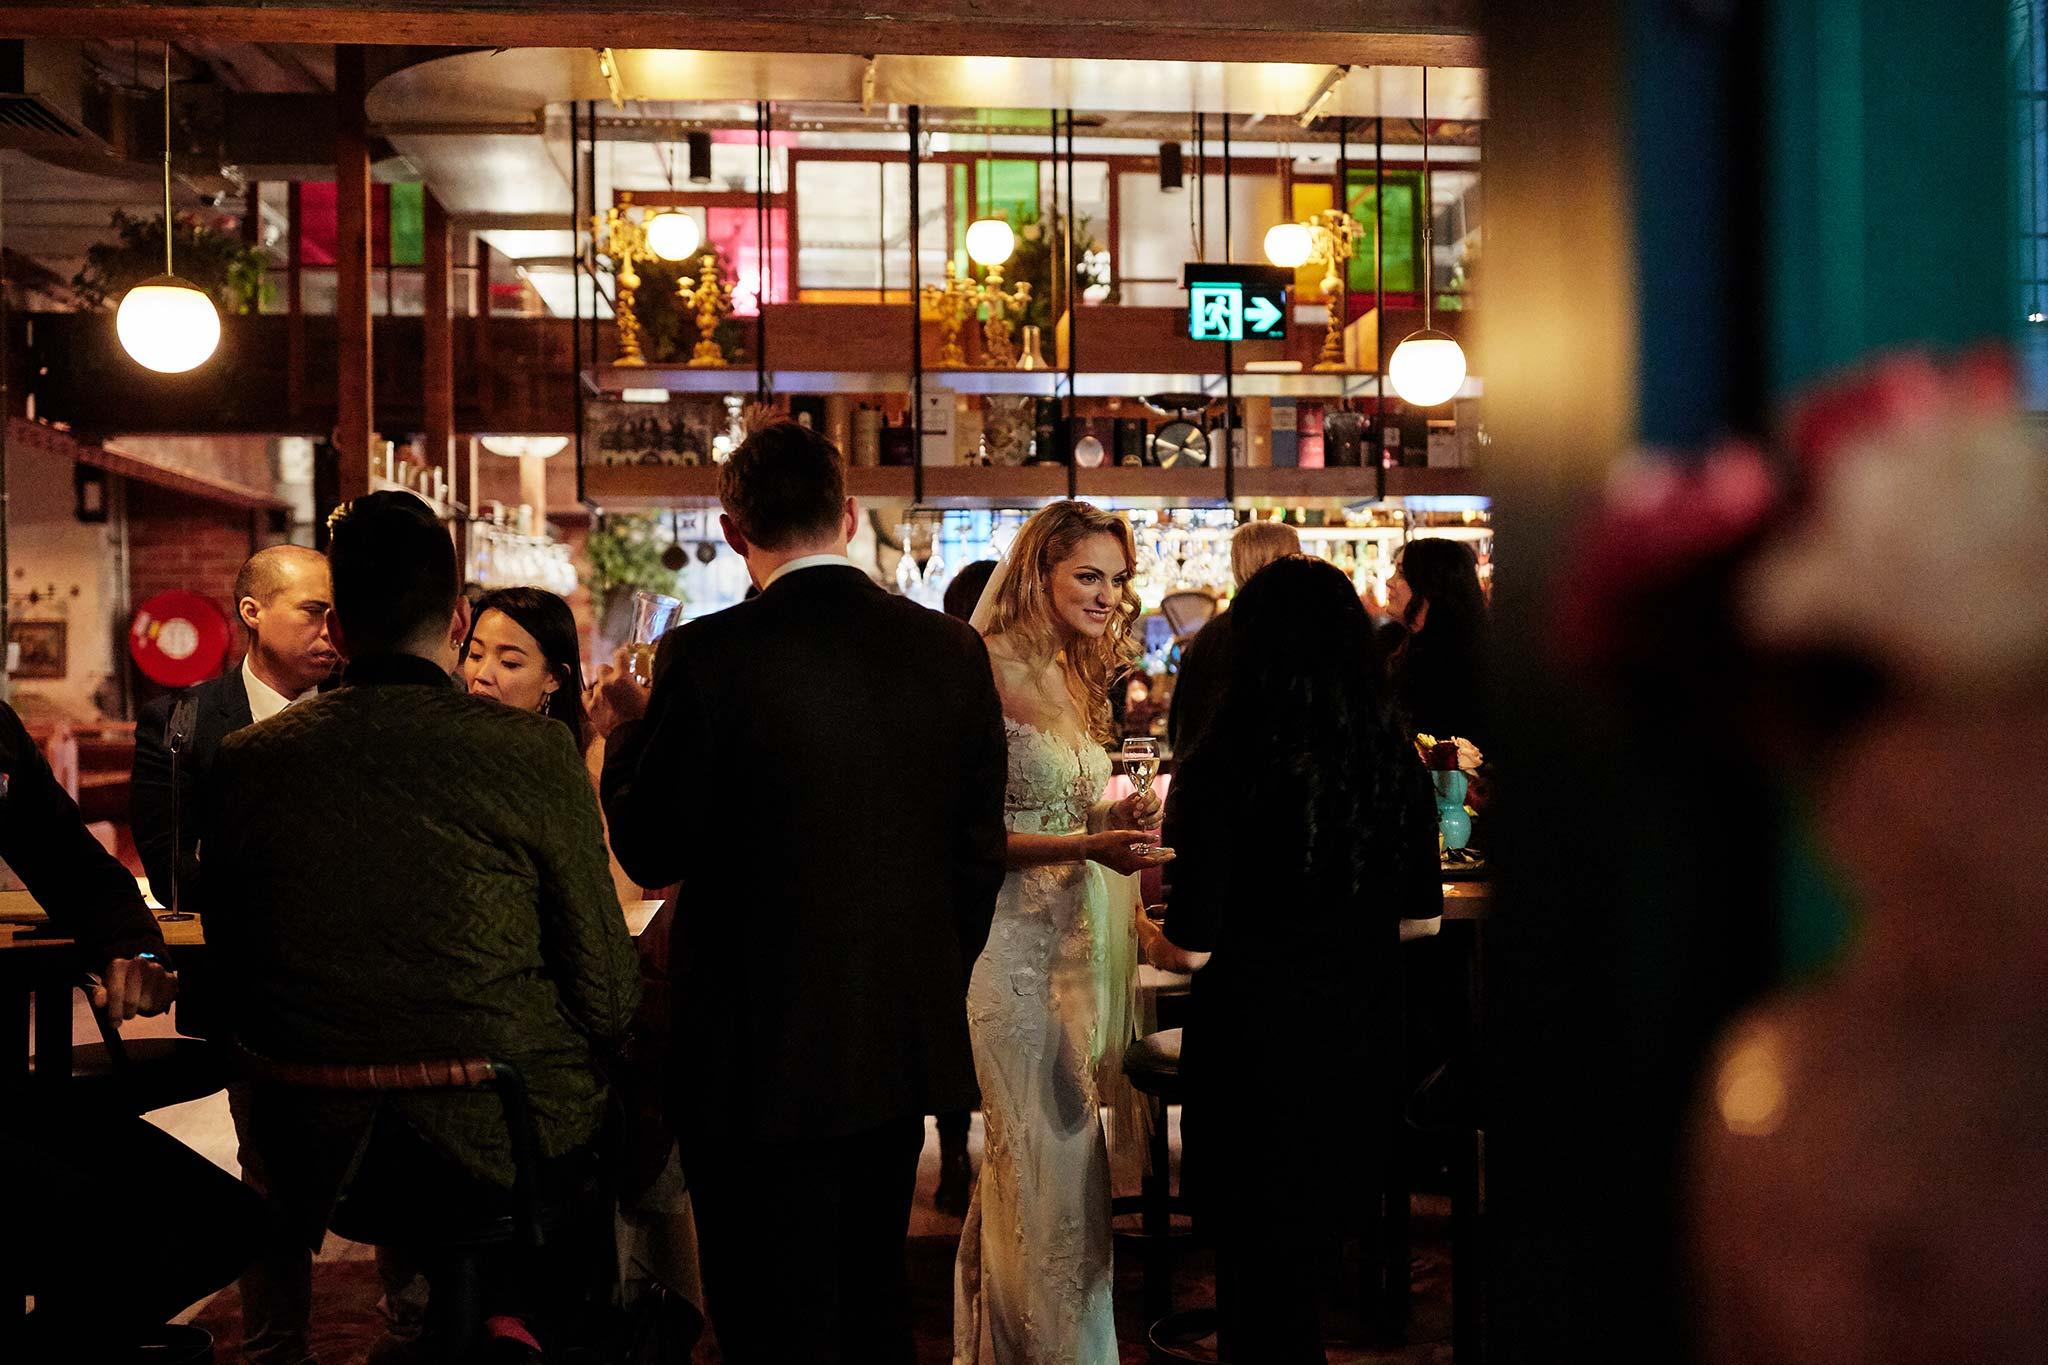 Melbourne-tour-bus-wedding-photographer-garden-state-hotel-lunch